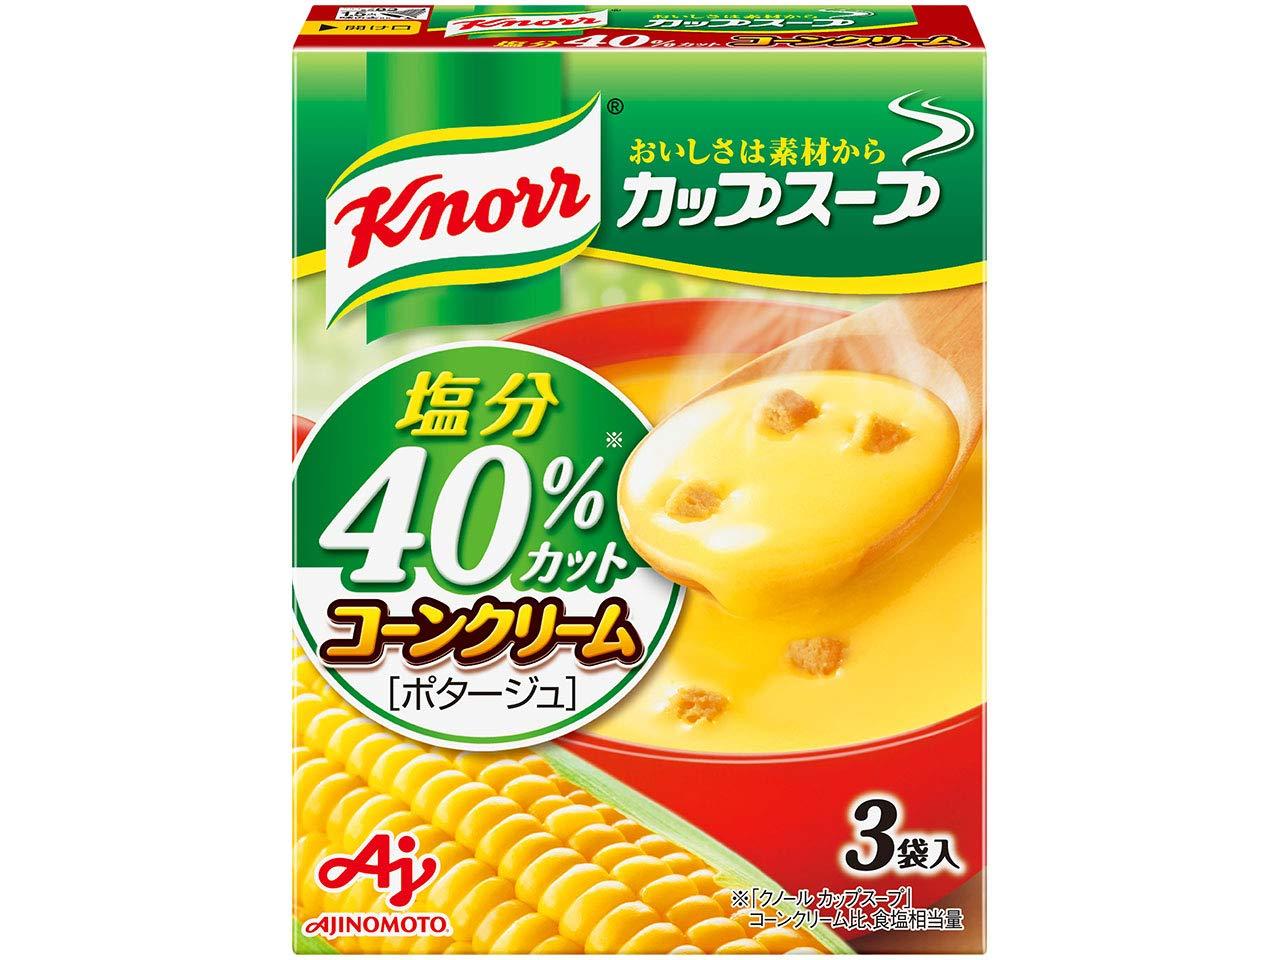 Ajinomoto Max 66% OFF Knorr 40% cup soup corn cream 54.6g salt Be super welcome ~ cut piec 10